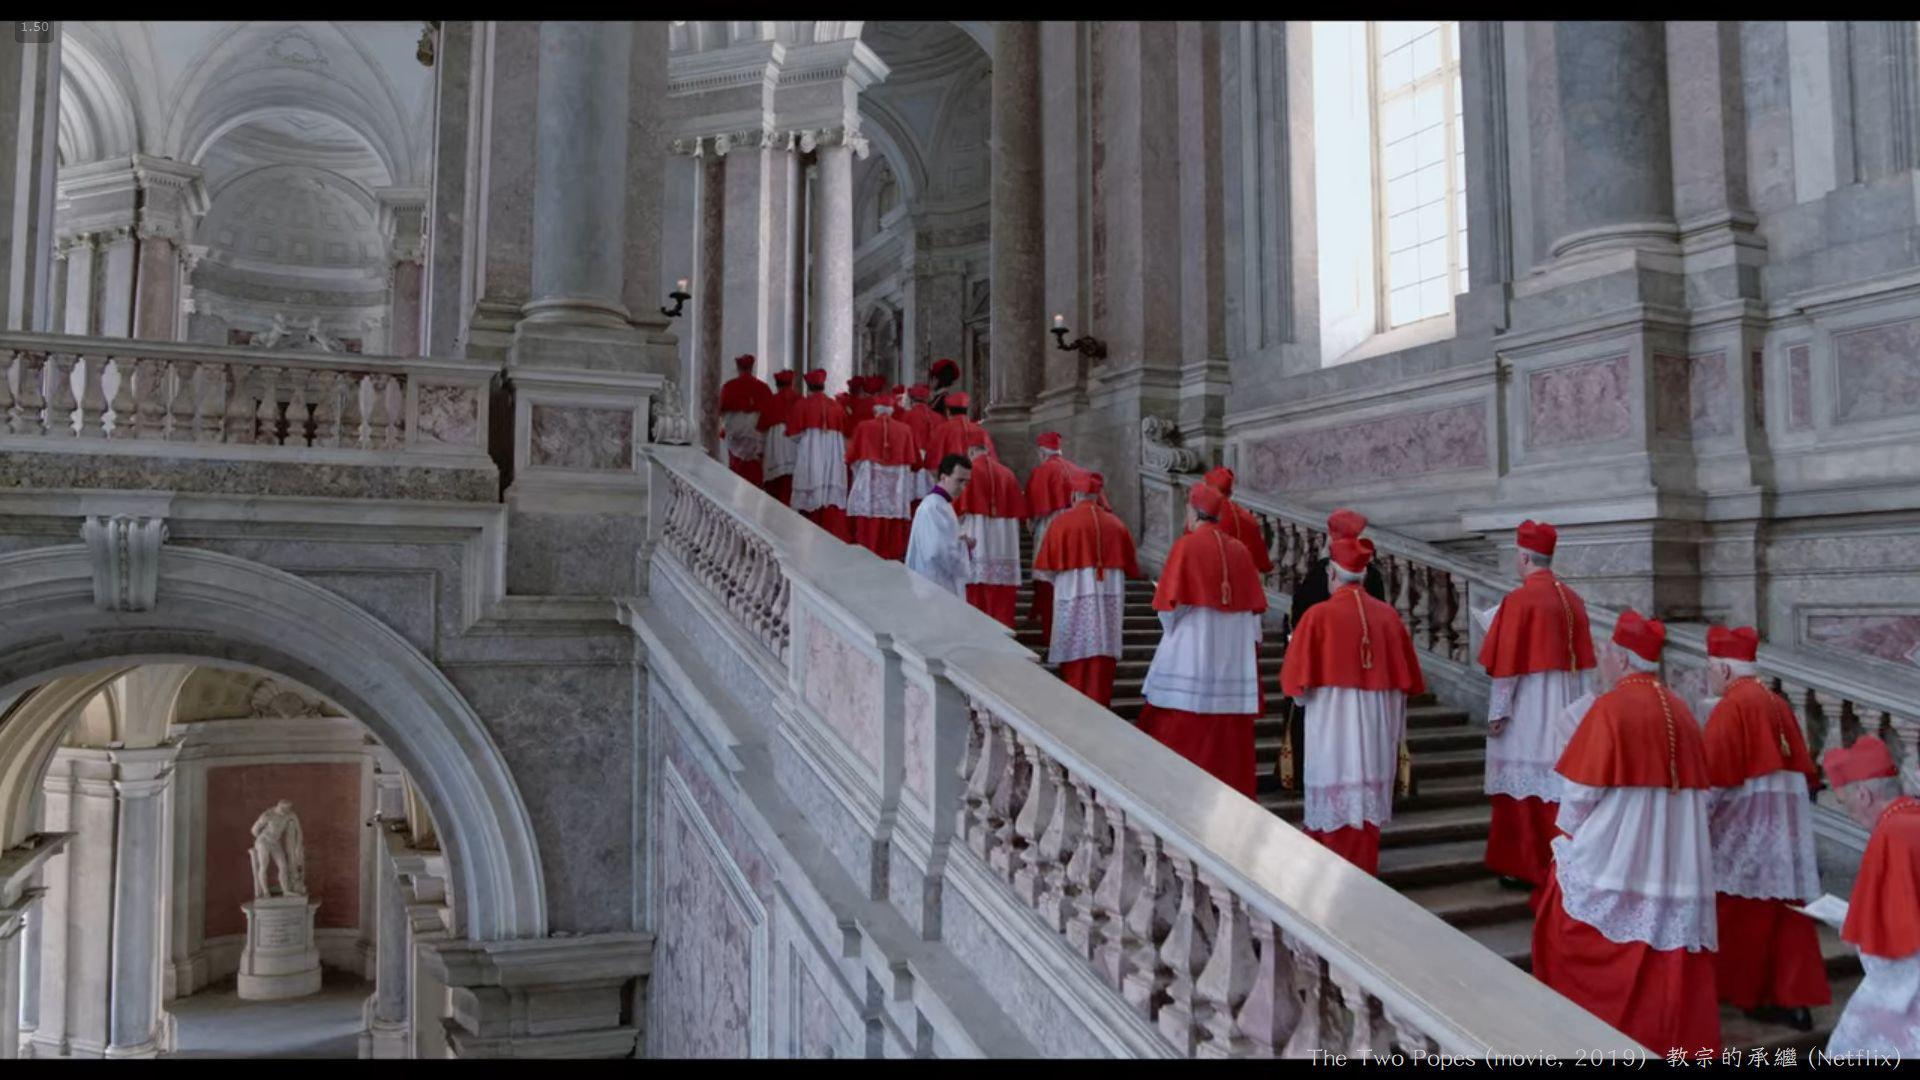 教宗的承繼(The Two Popes)2019 電影-004---.jpg